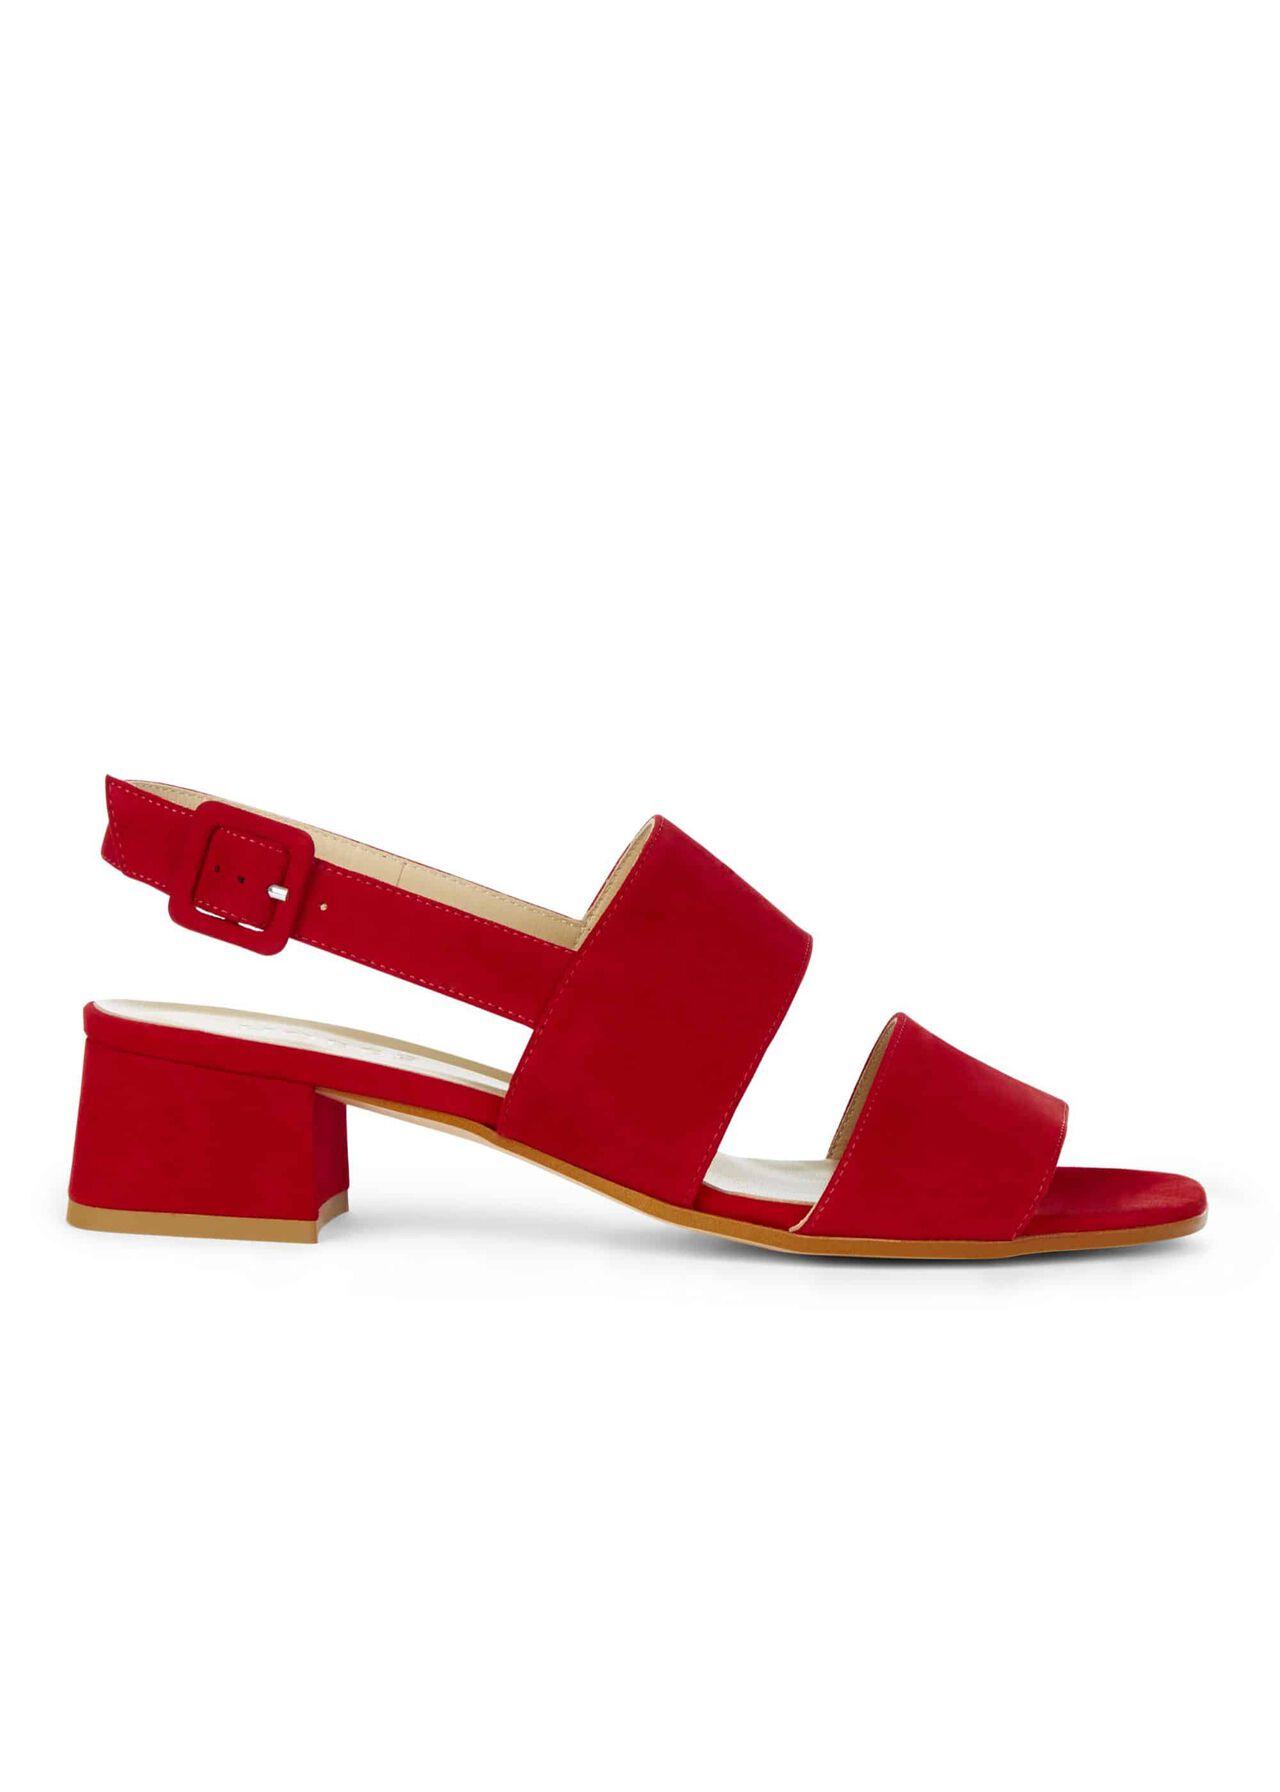 Claudia Sandal Scarlet Red